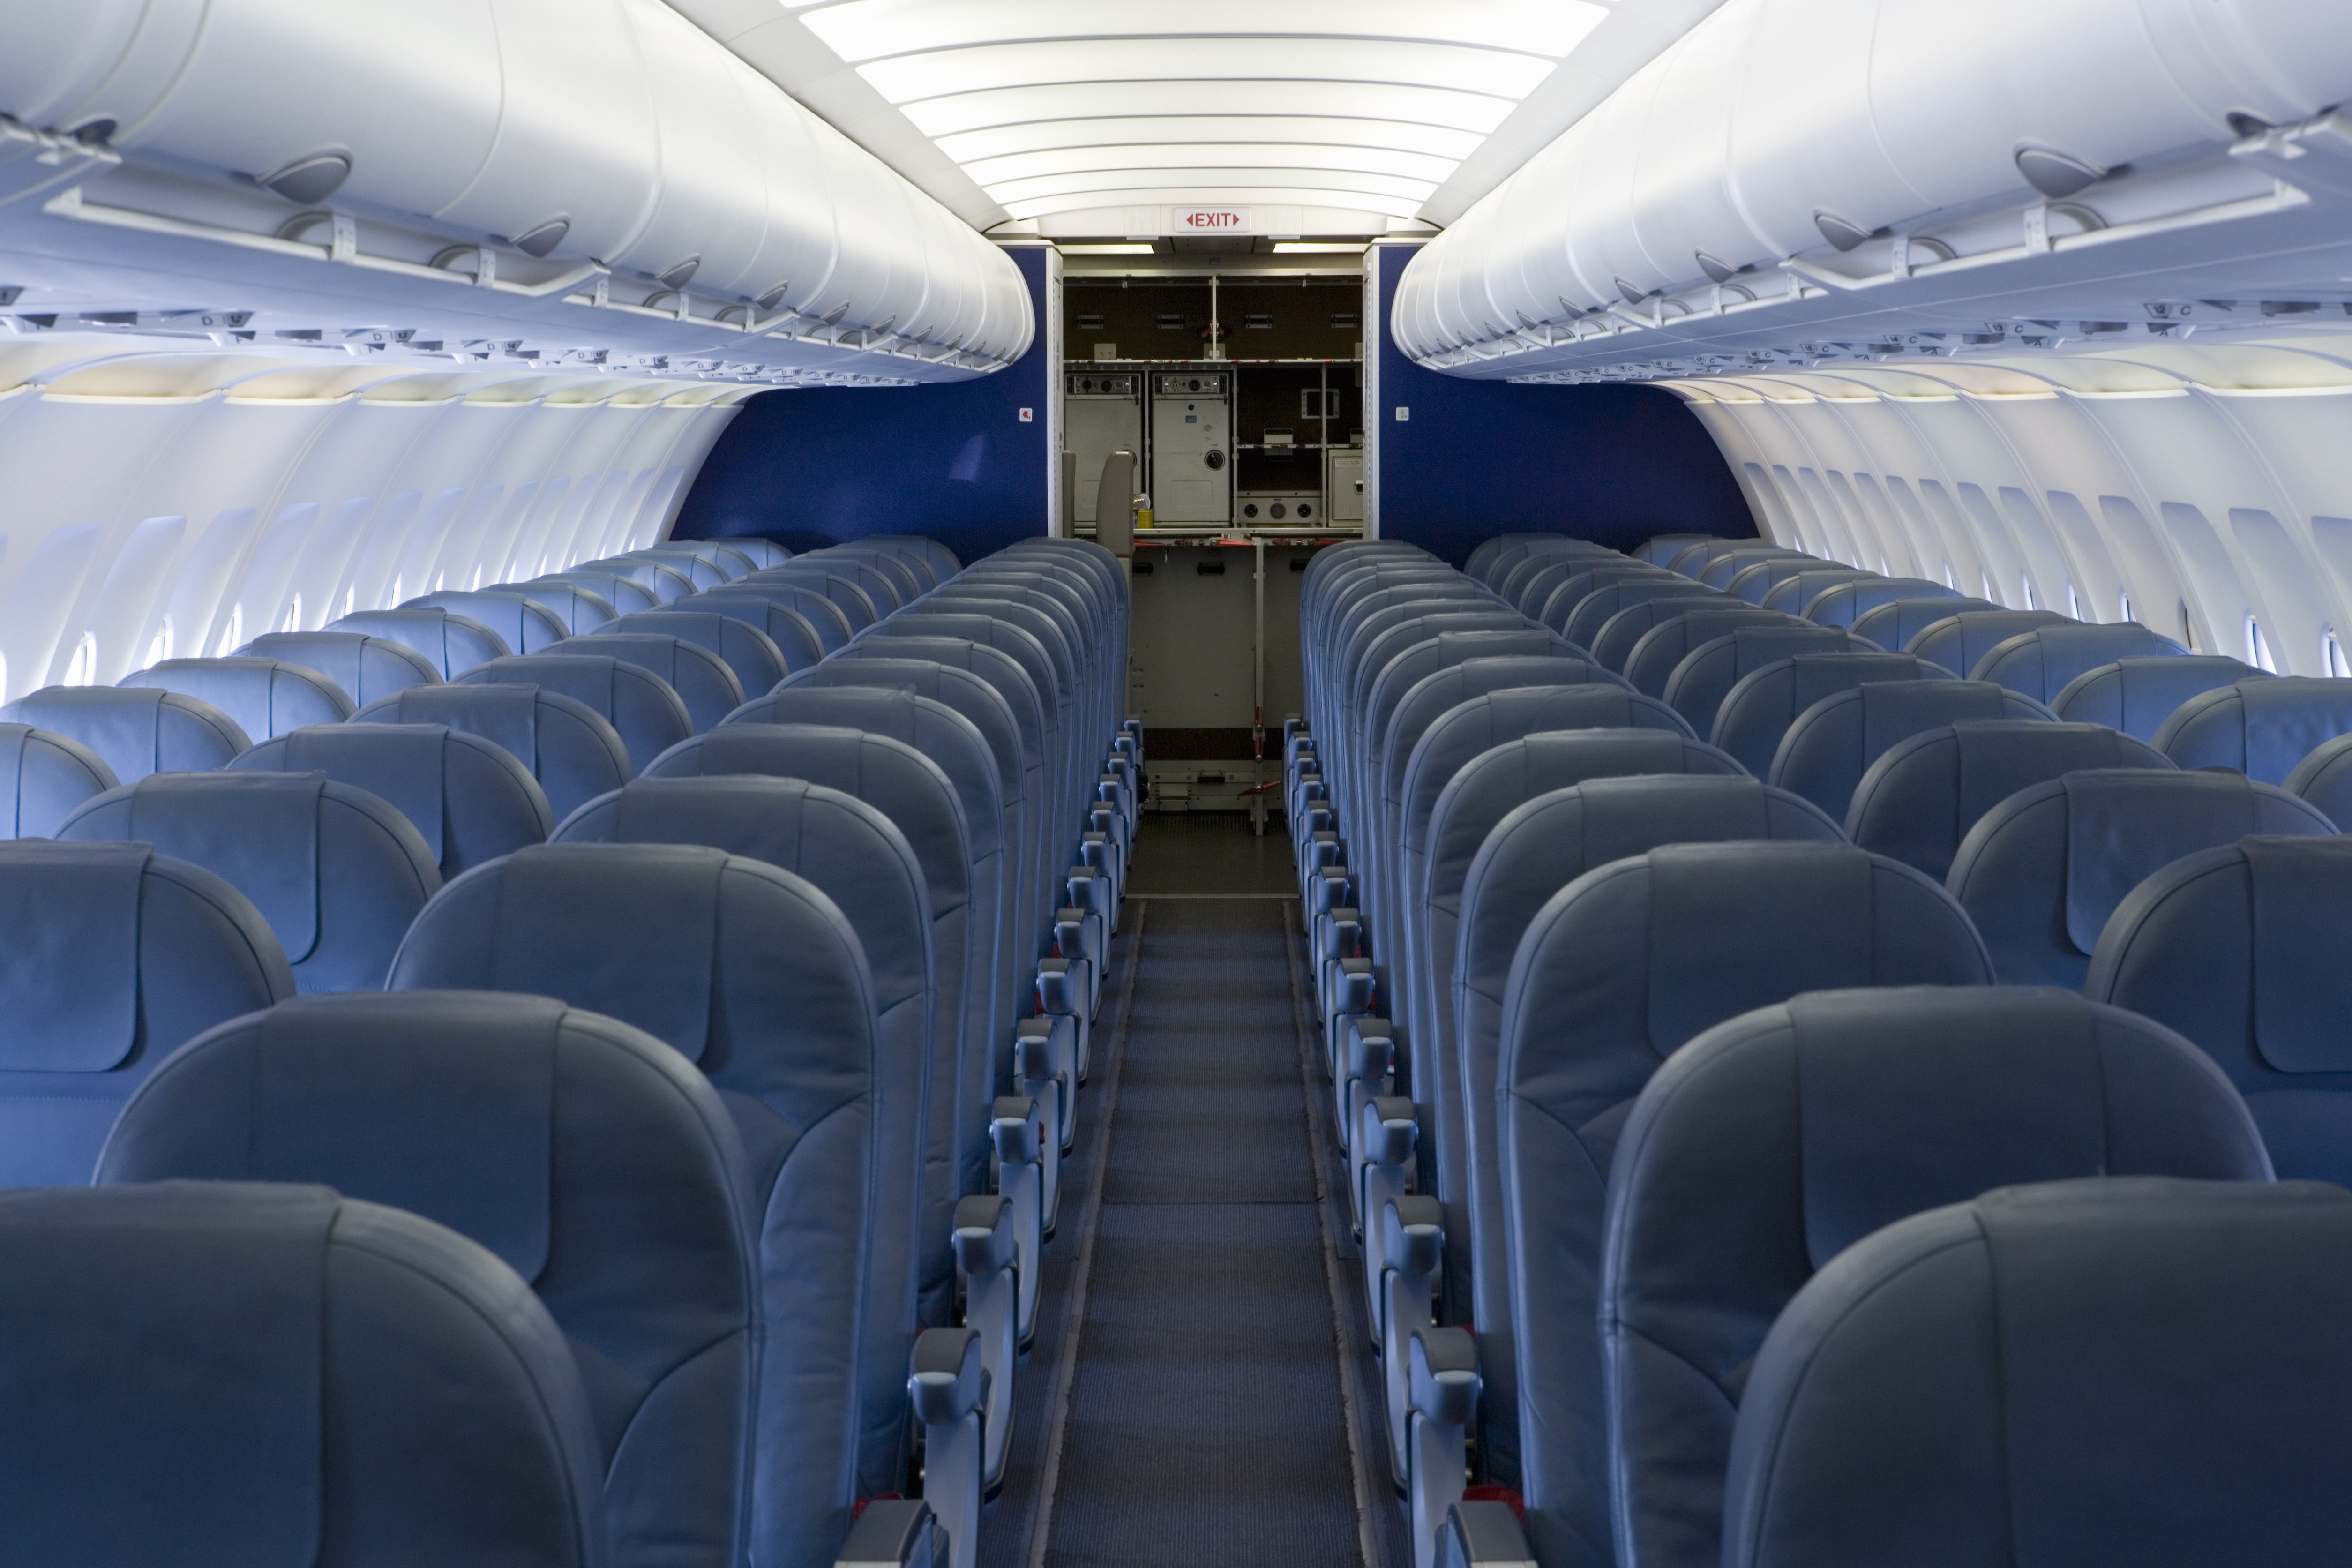 Bulkhead Seating on an Airplane